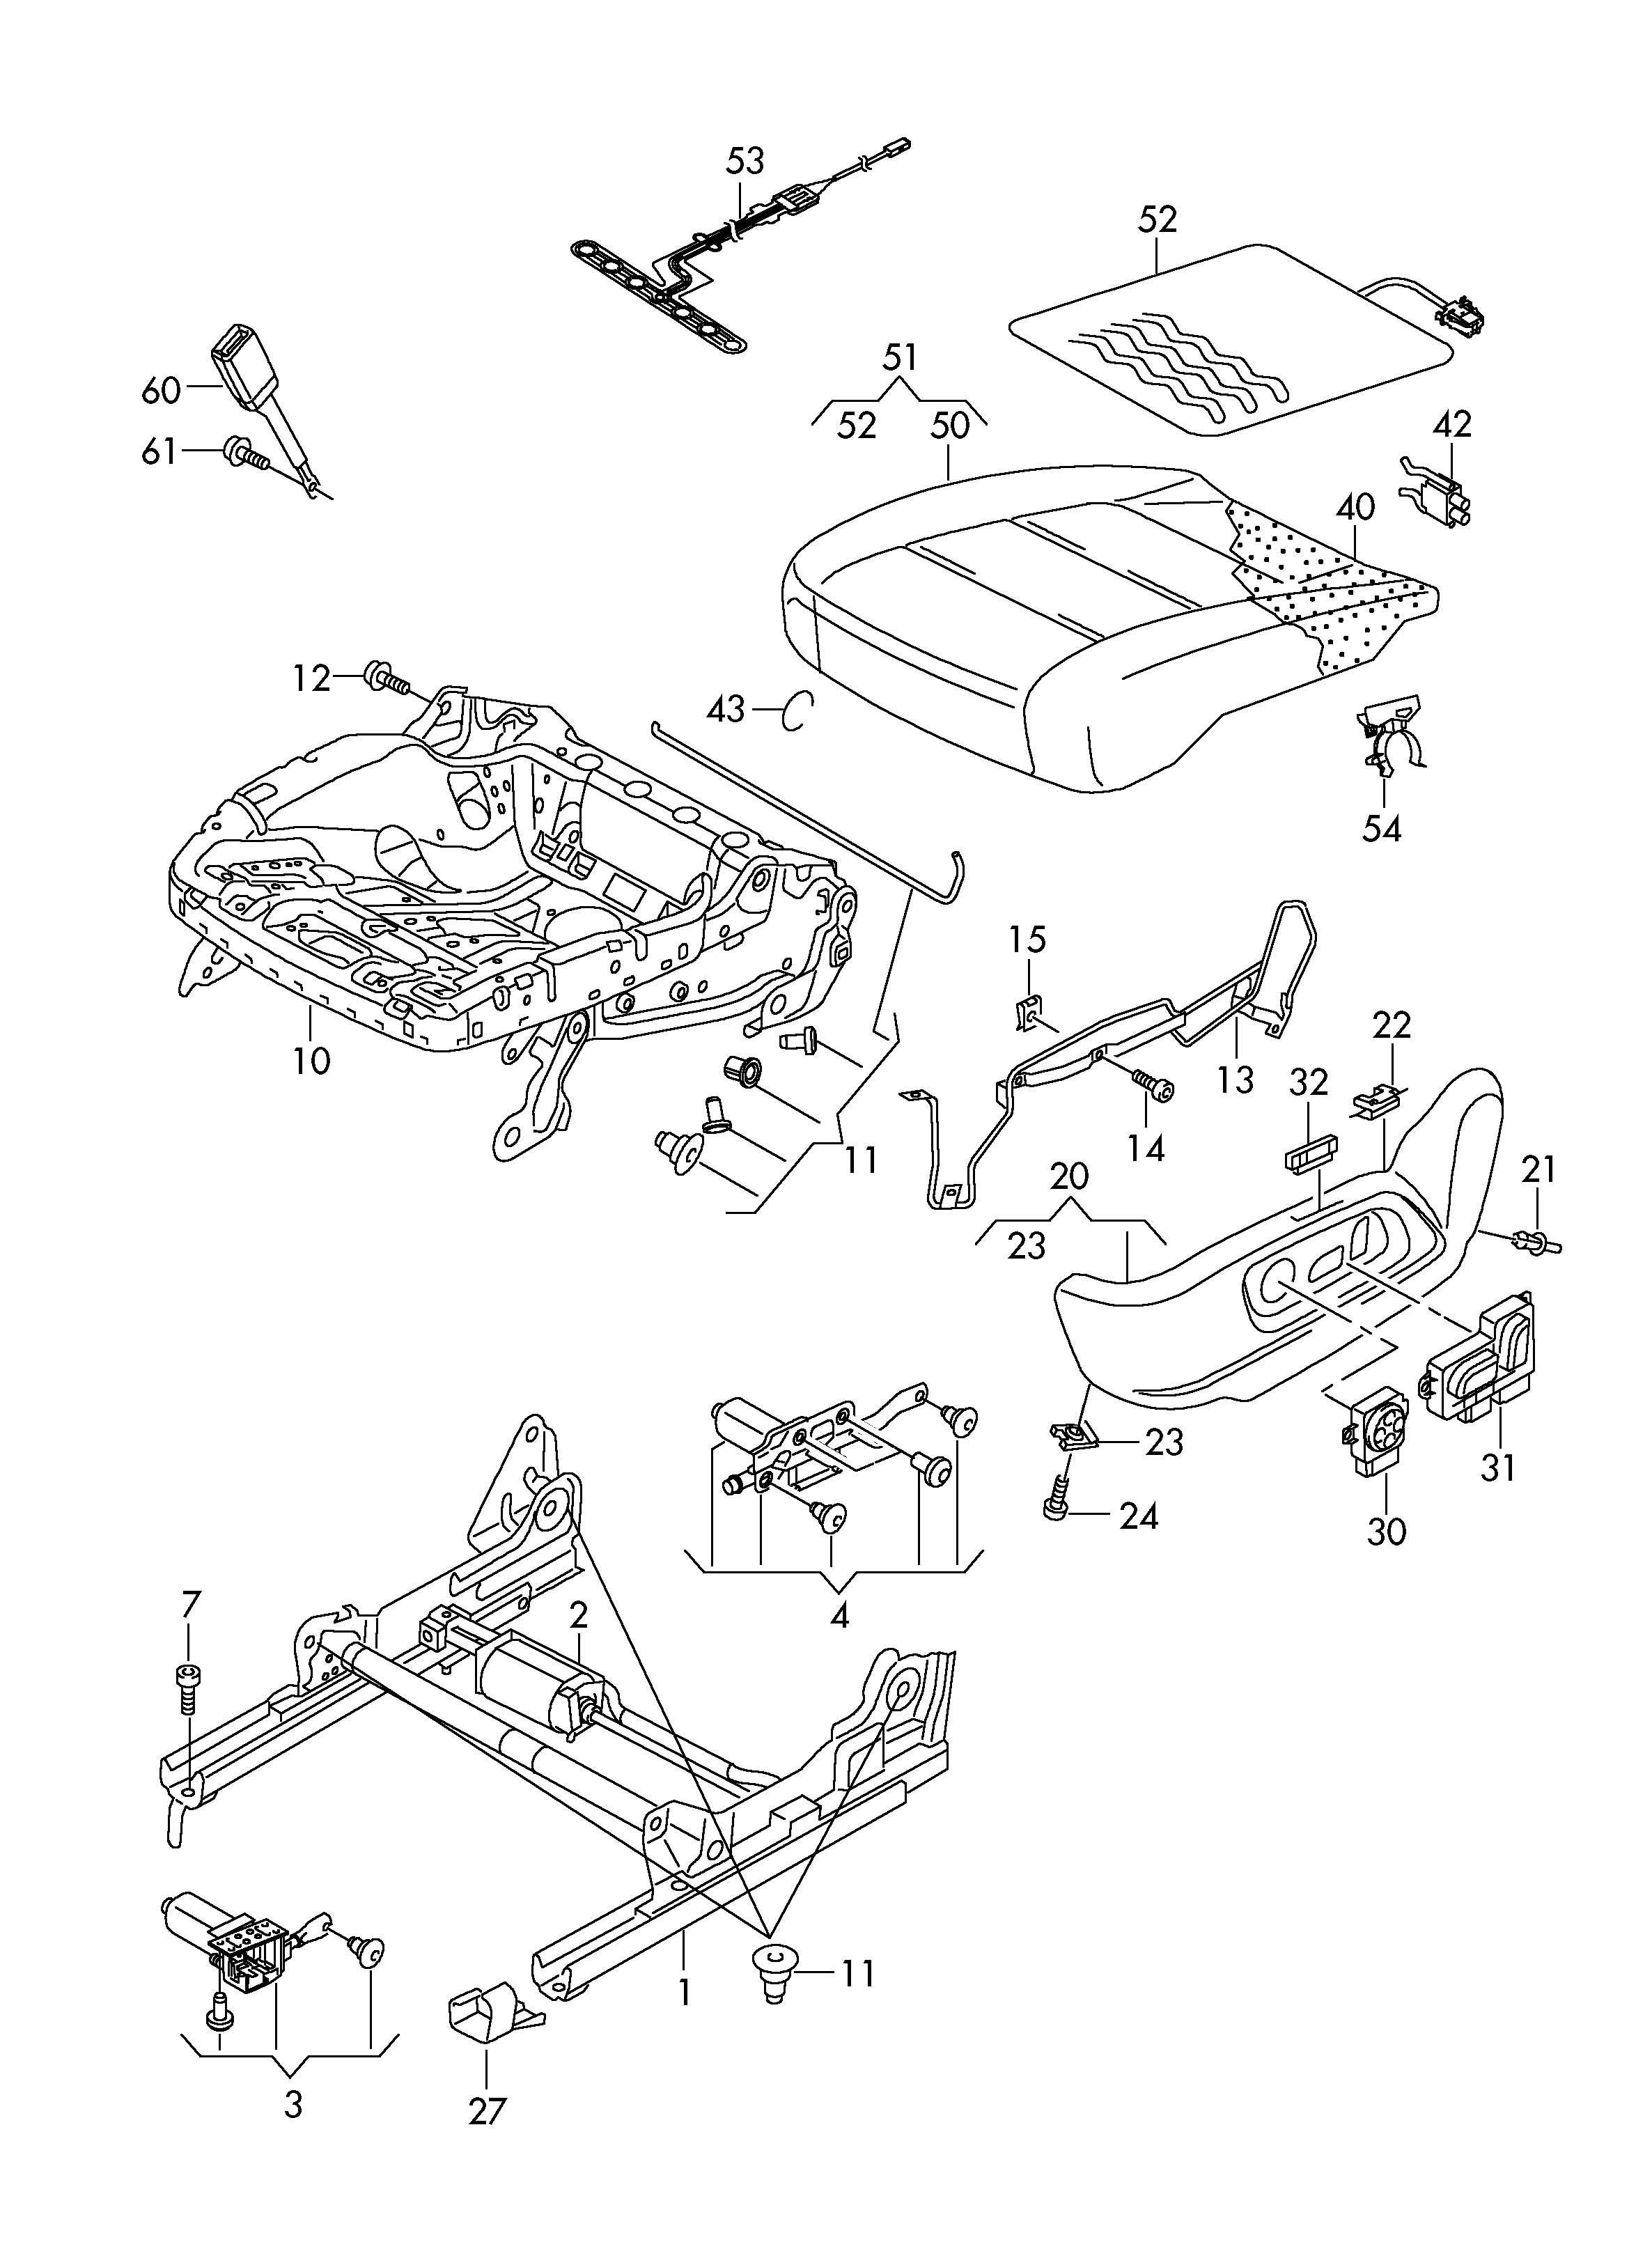 Volkswagen Tiguan Cushion frame bolt. Screw. Seat Adjuster